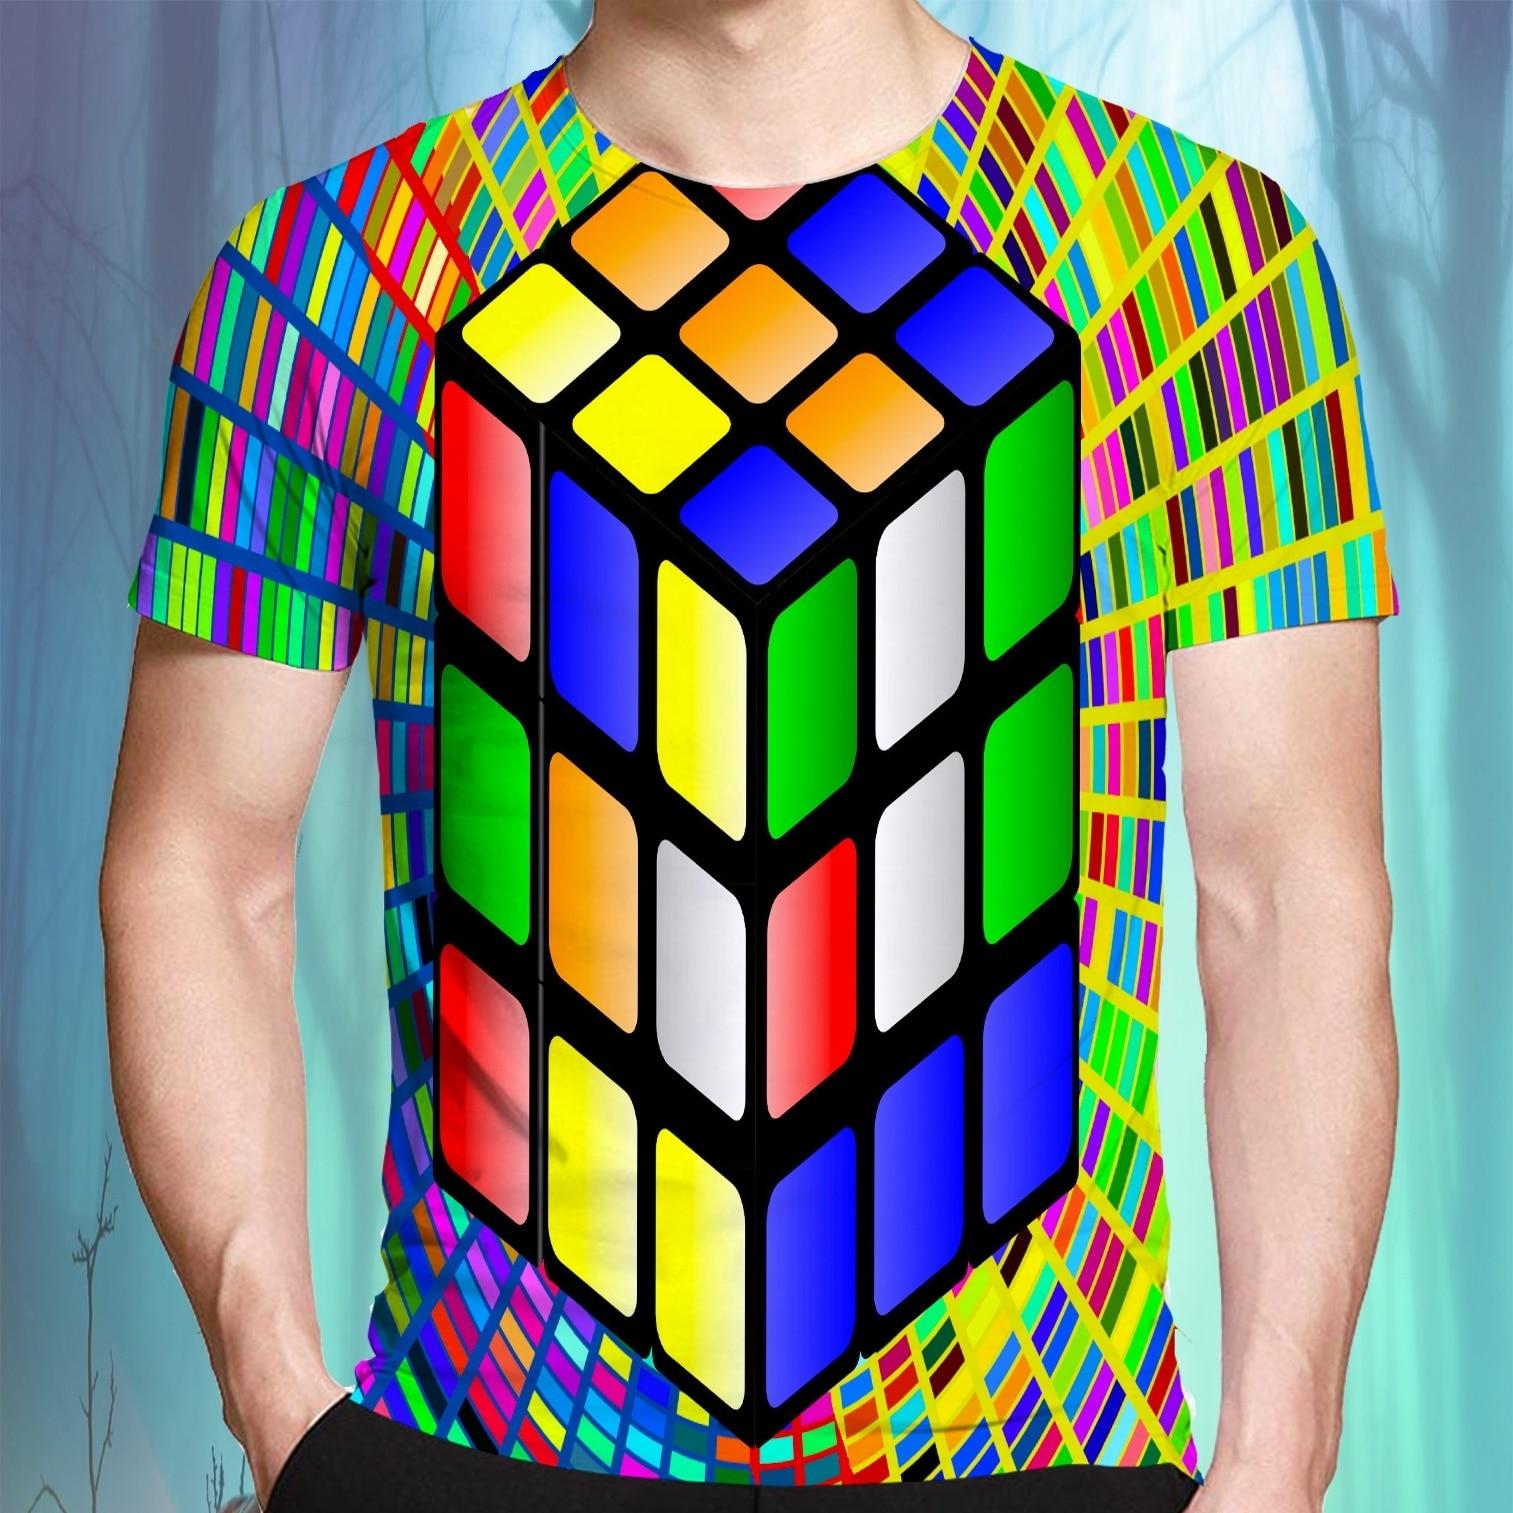 De moda para hombre divertido 3D impresión T camisas de vértigo hipnótico cubo mágico Arco Iris camisa